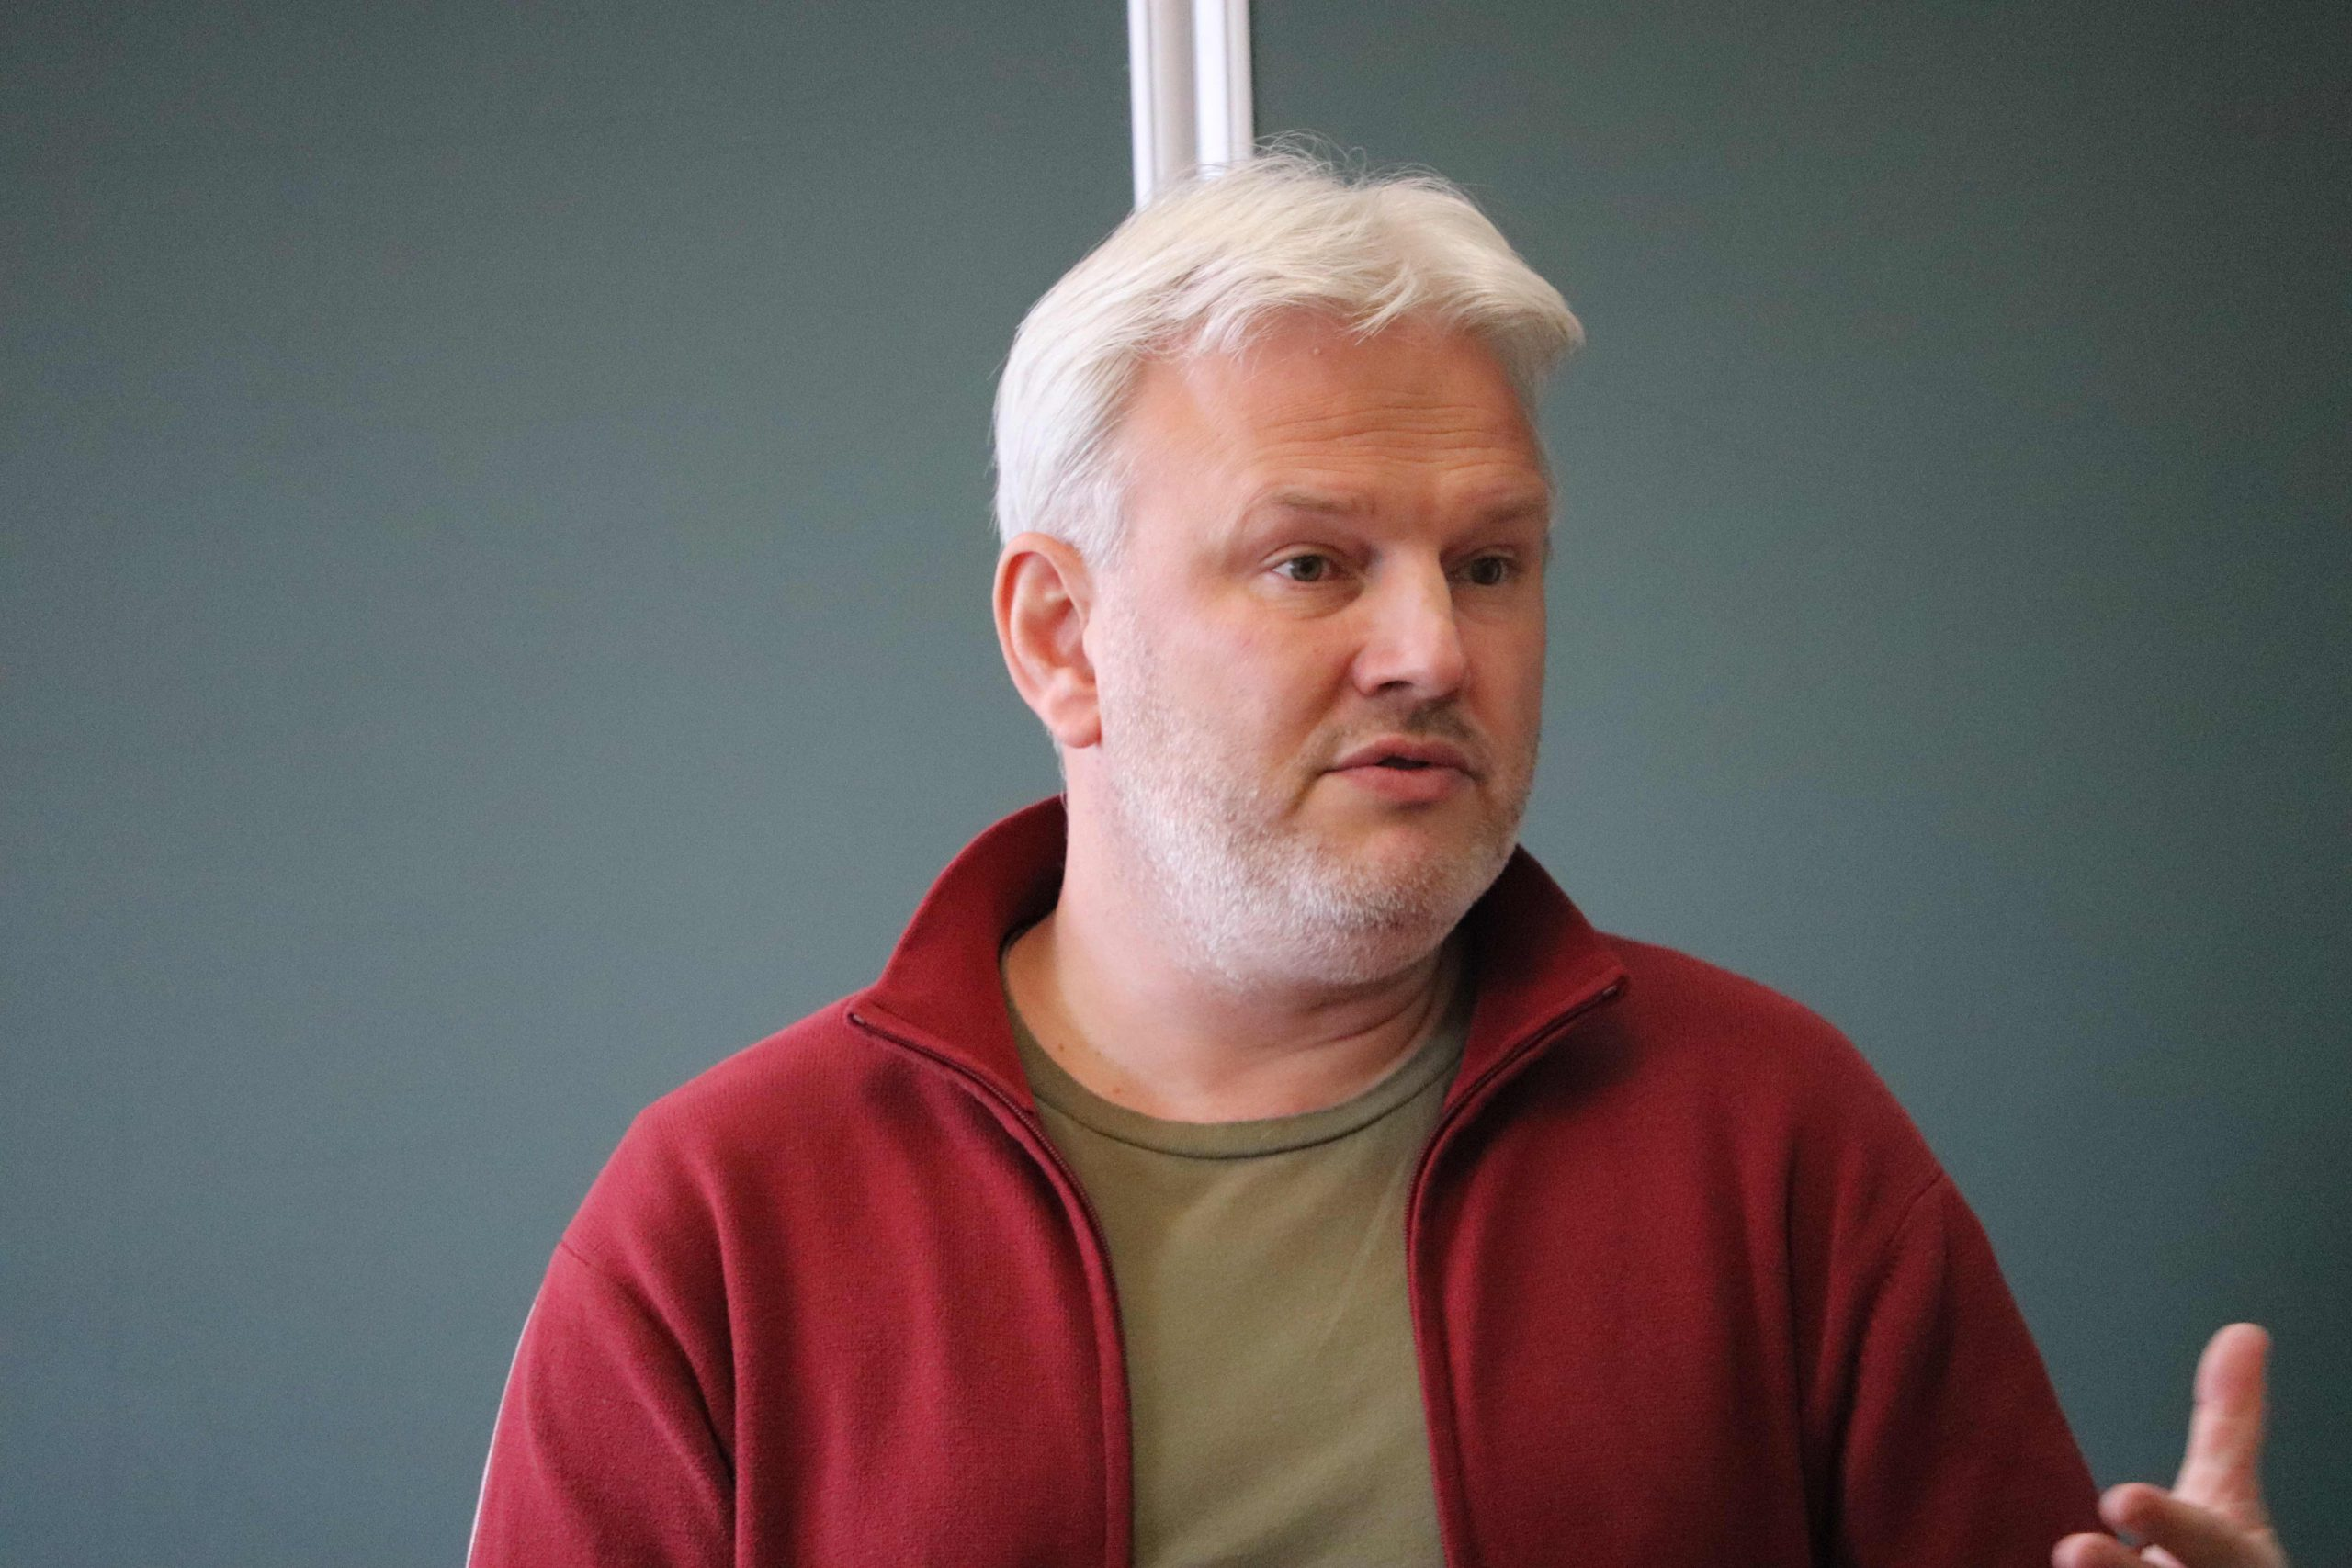 Volodymyr Dubovyk